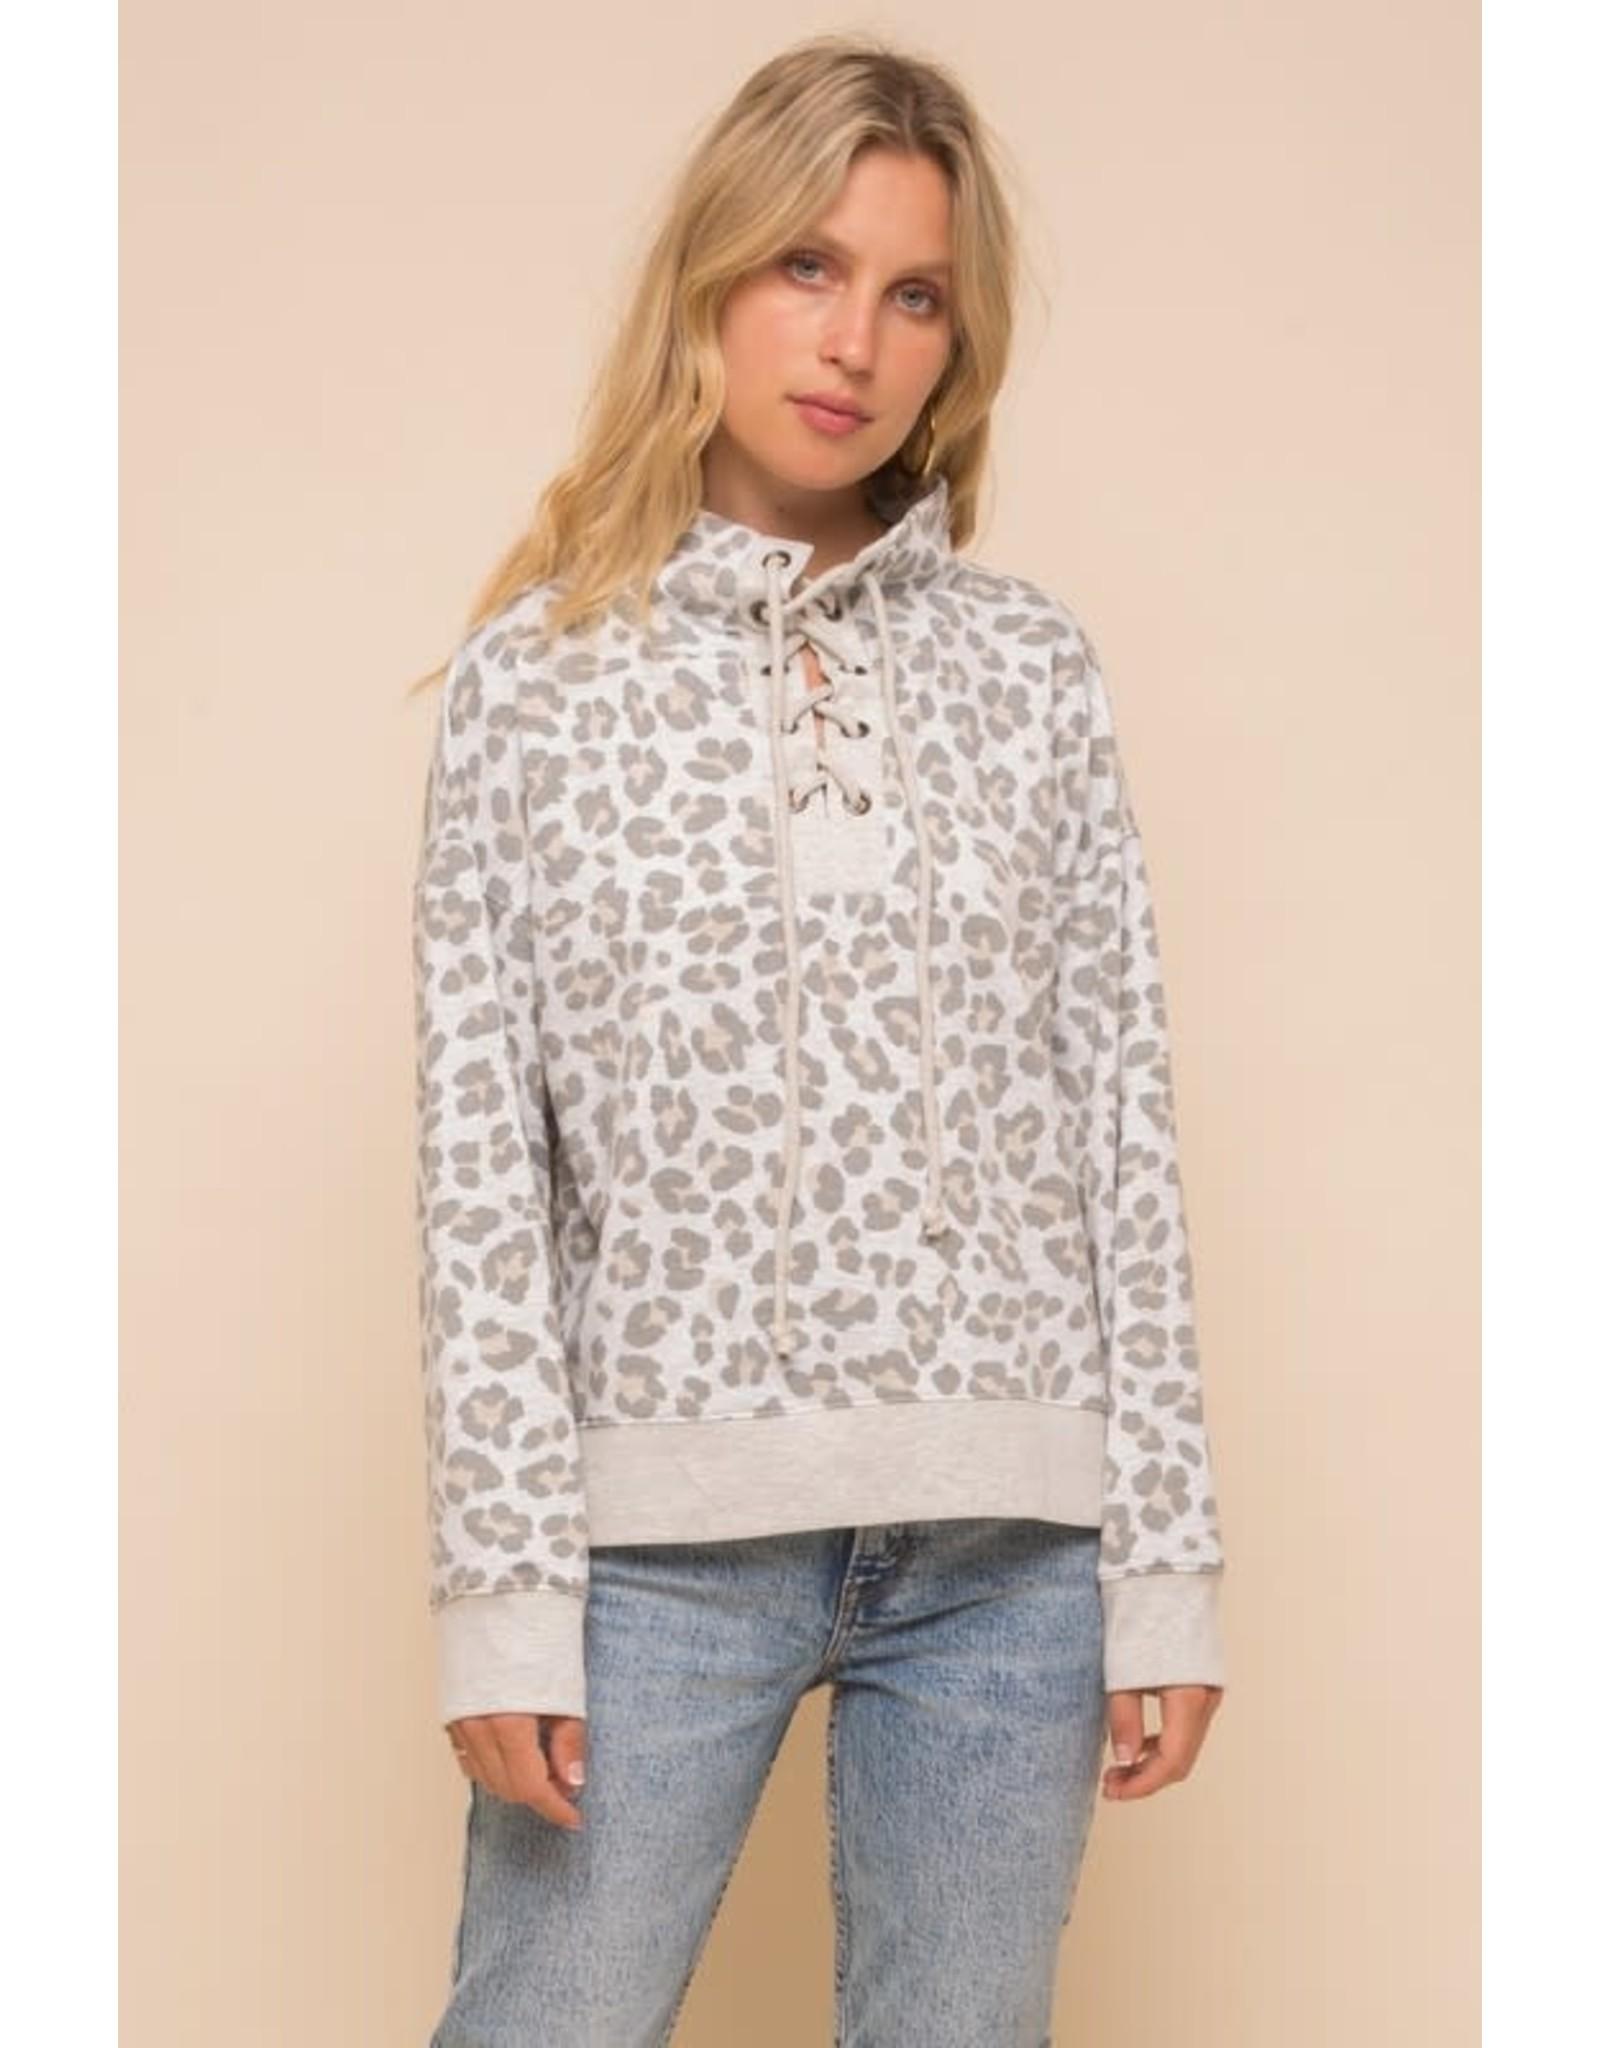 TLC Leopard Lace Up Hoodie